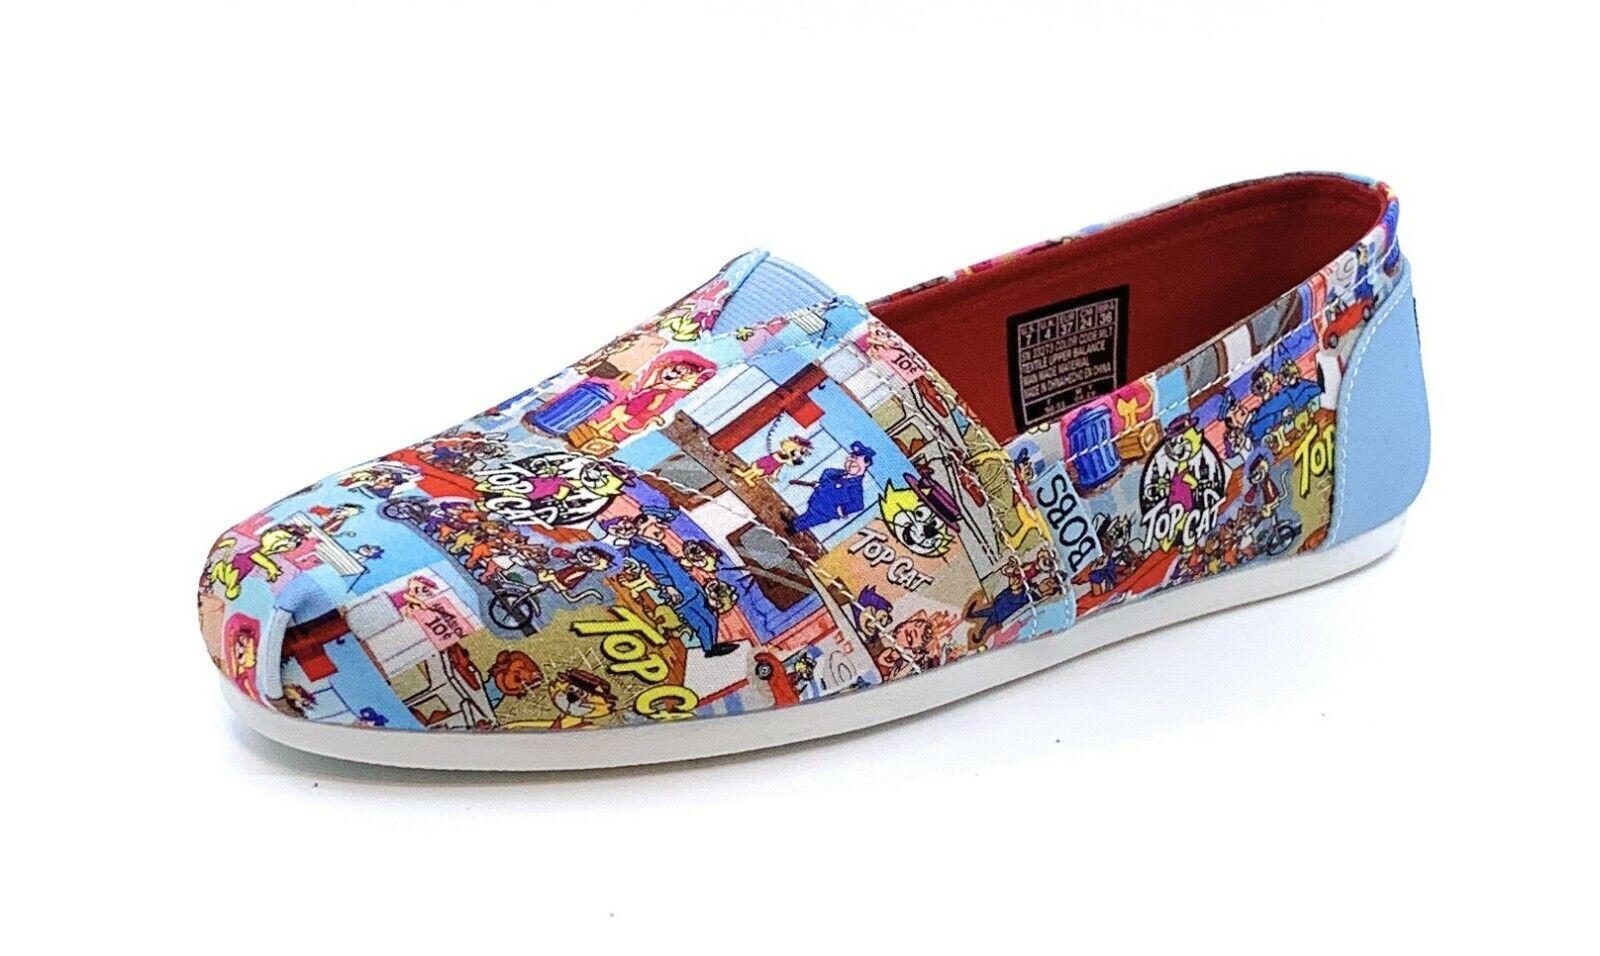 Skechers BOBS Women's Slip On Canvas Casual Shoes Bobs Plush Boss Cat 33273/MLT